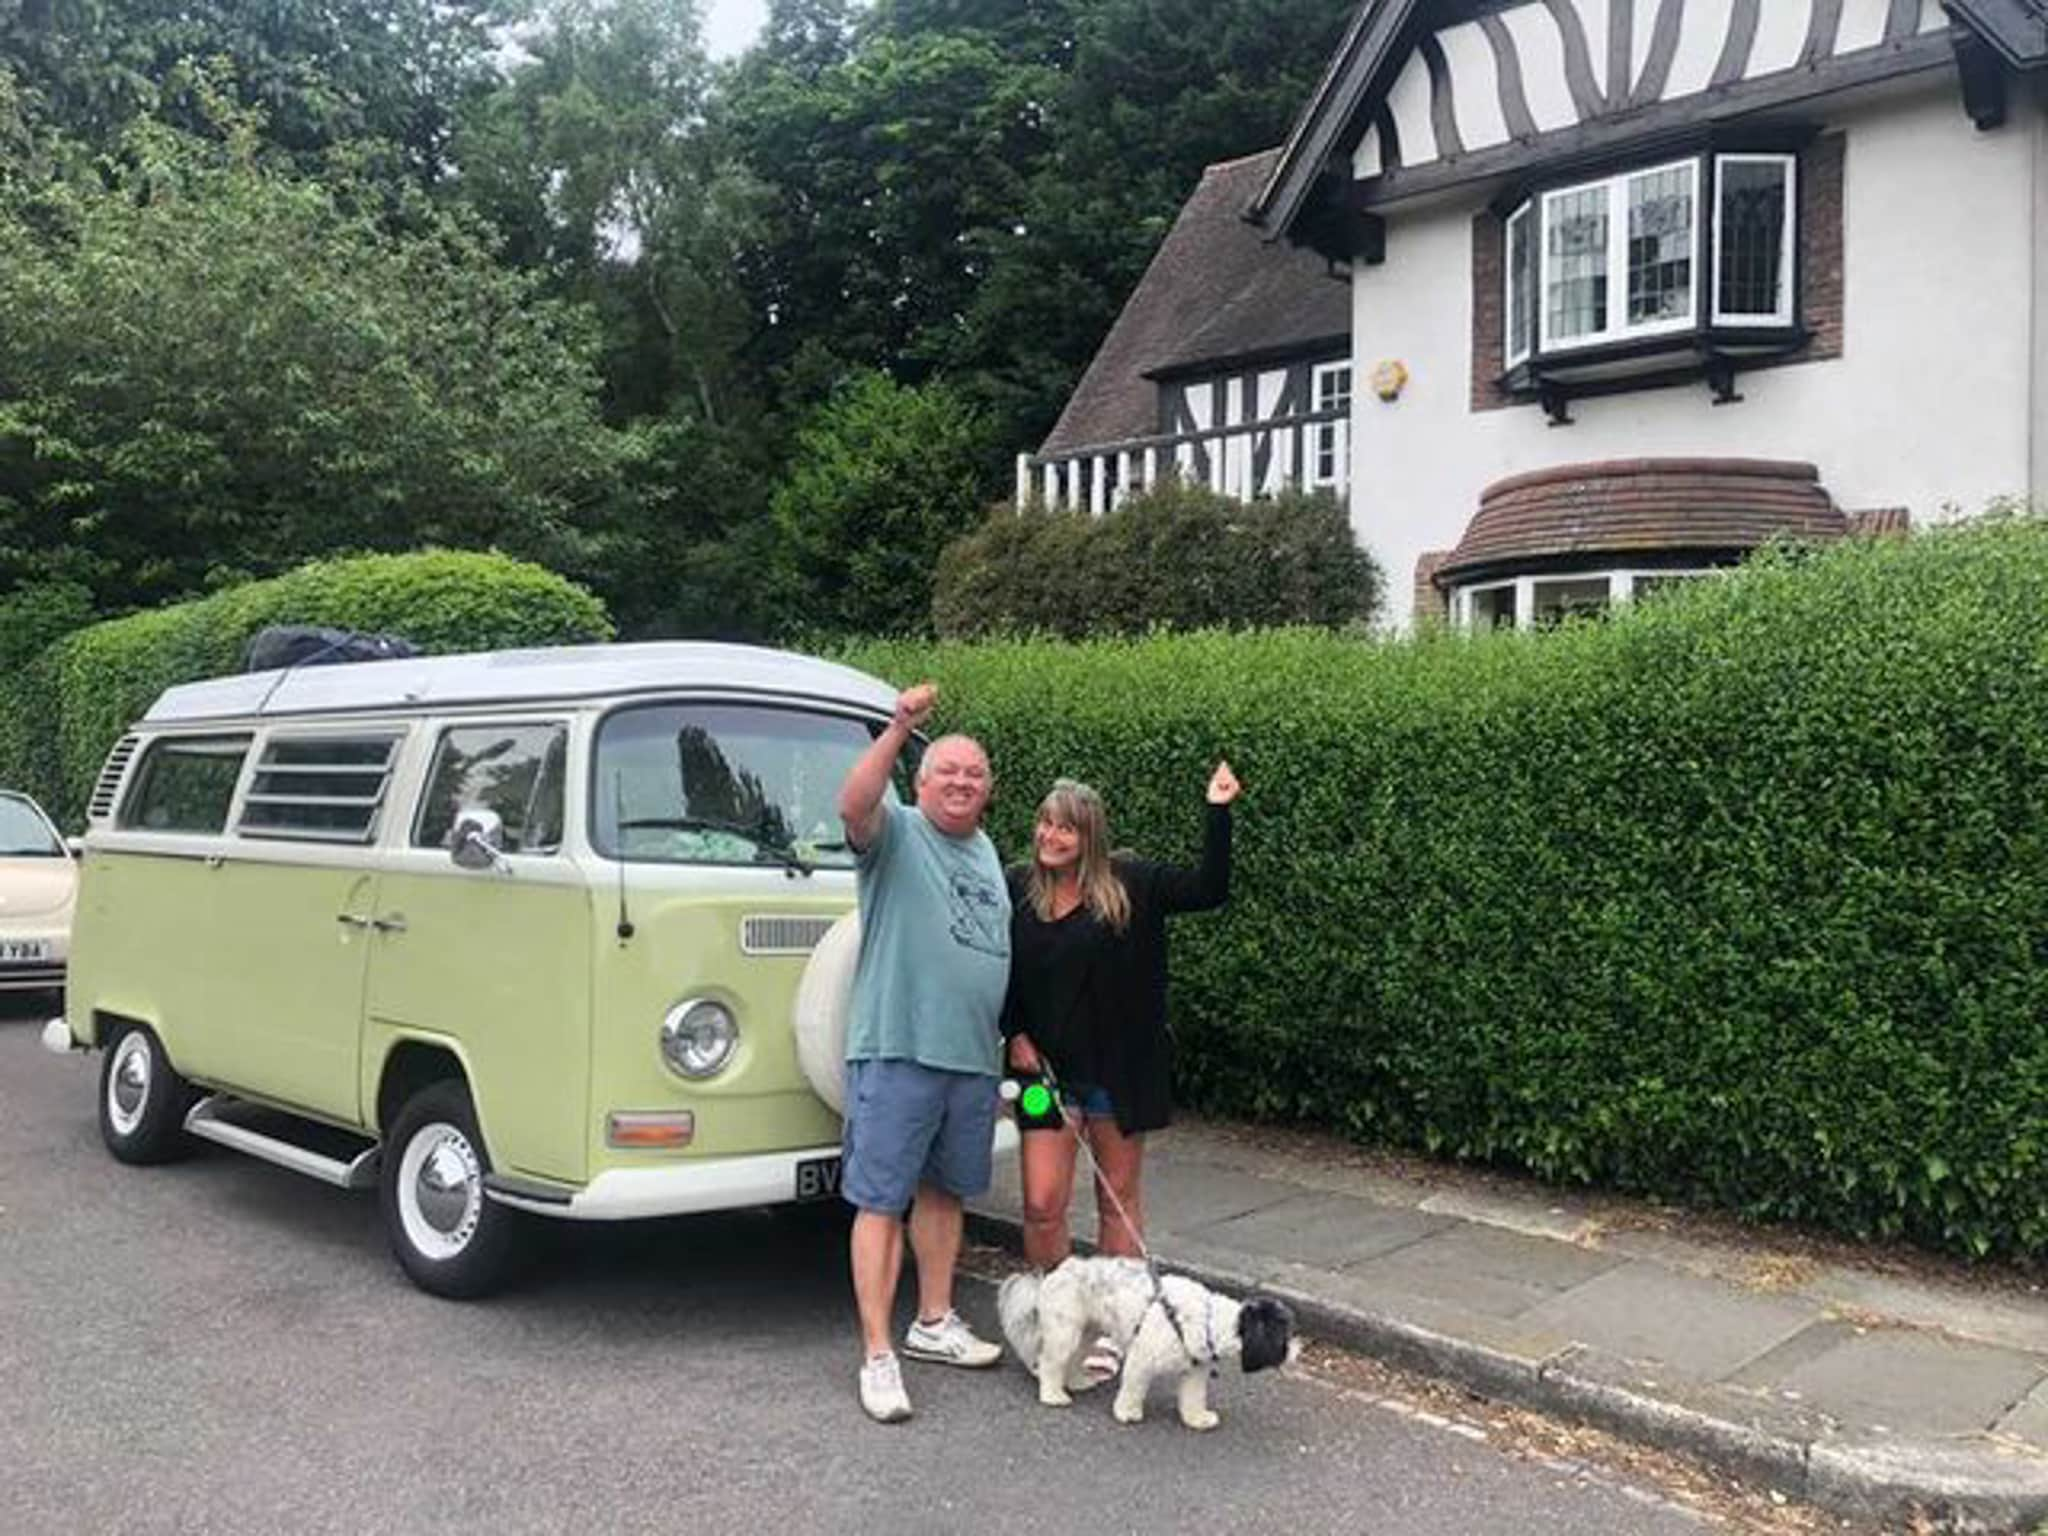 Winner Steven Darch of a Staycation VW Camper Hire - 22nd March